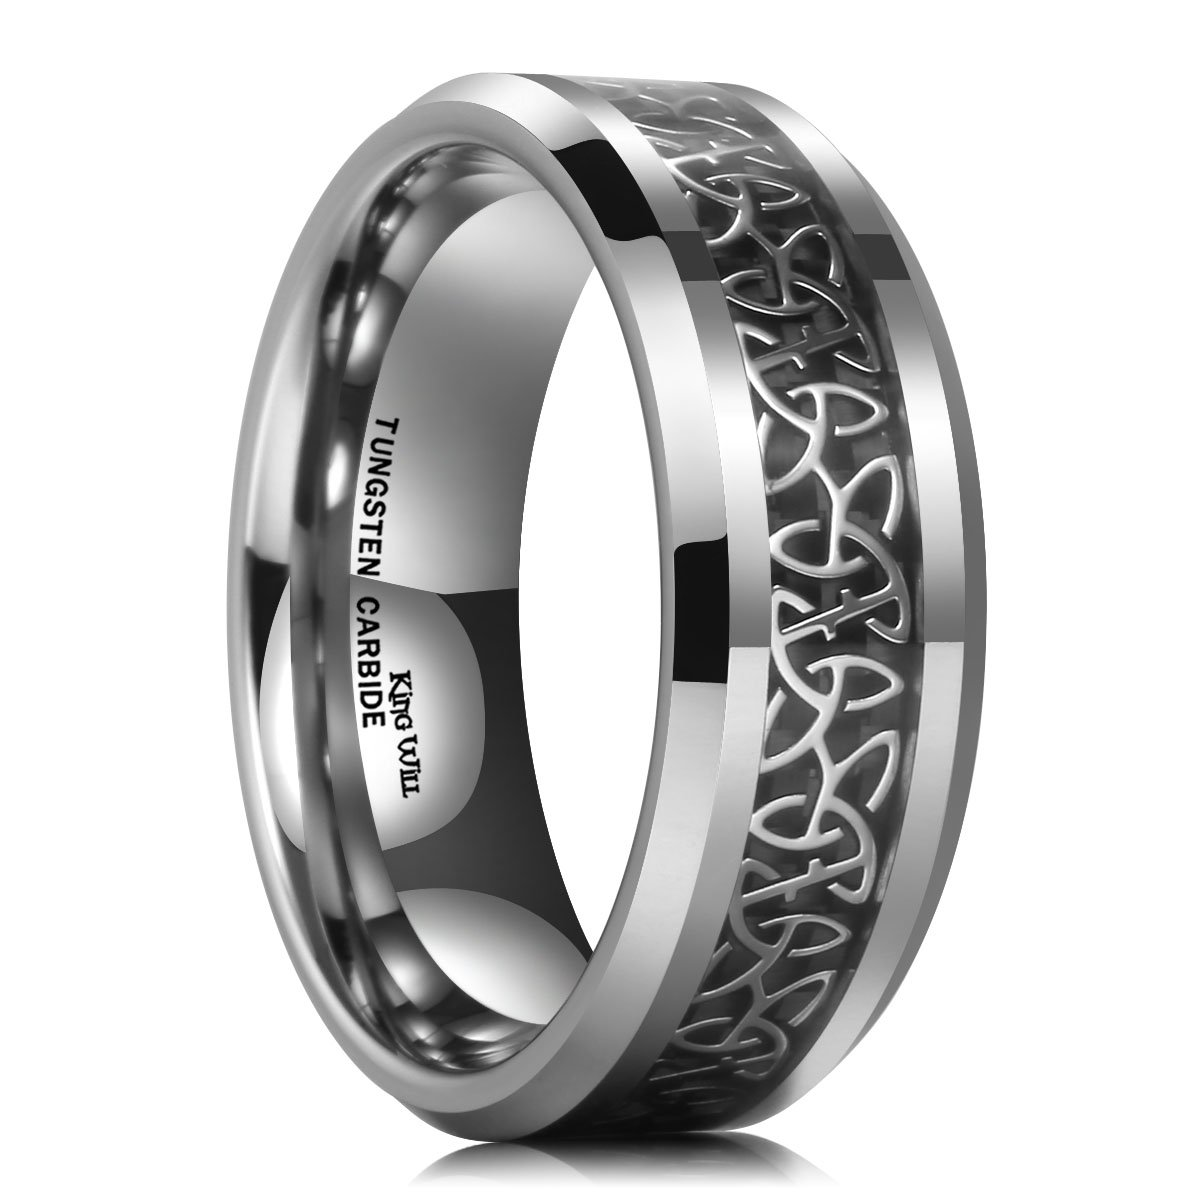 VAKKI Mens 8mm Laser Celtic Knot Brushed Tungsten Carbide Wedding Band Rings Polished Step Edge Size 6-14